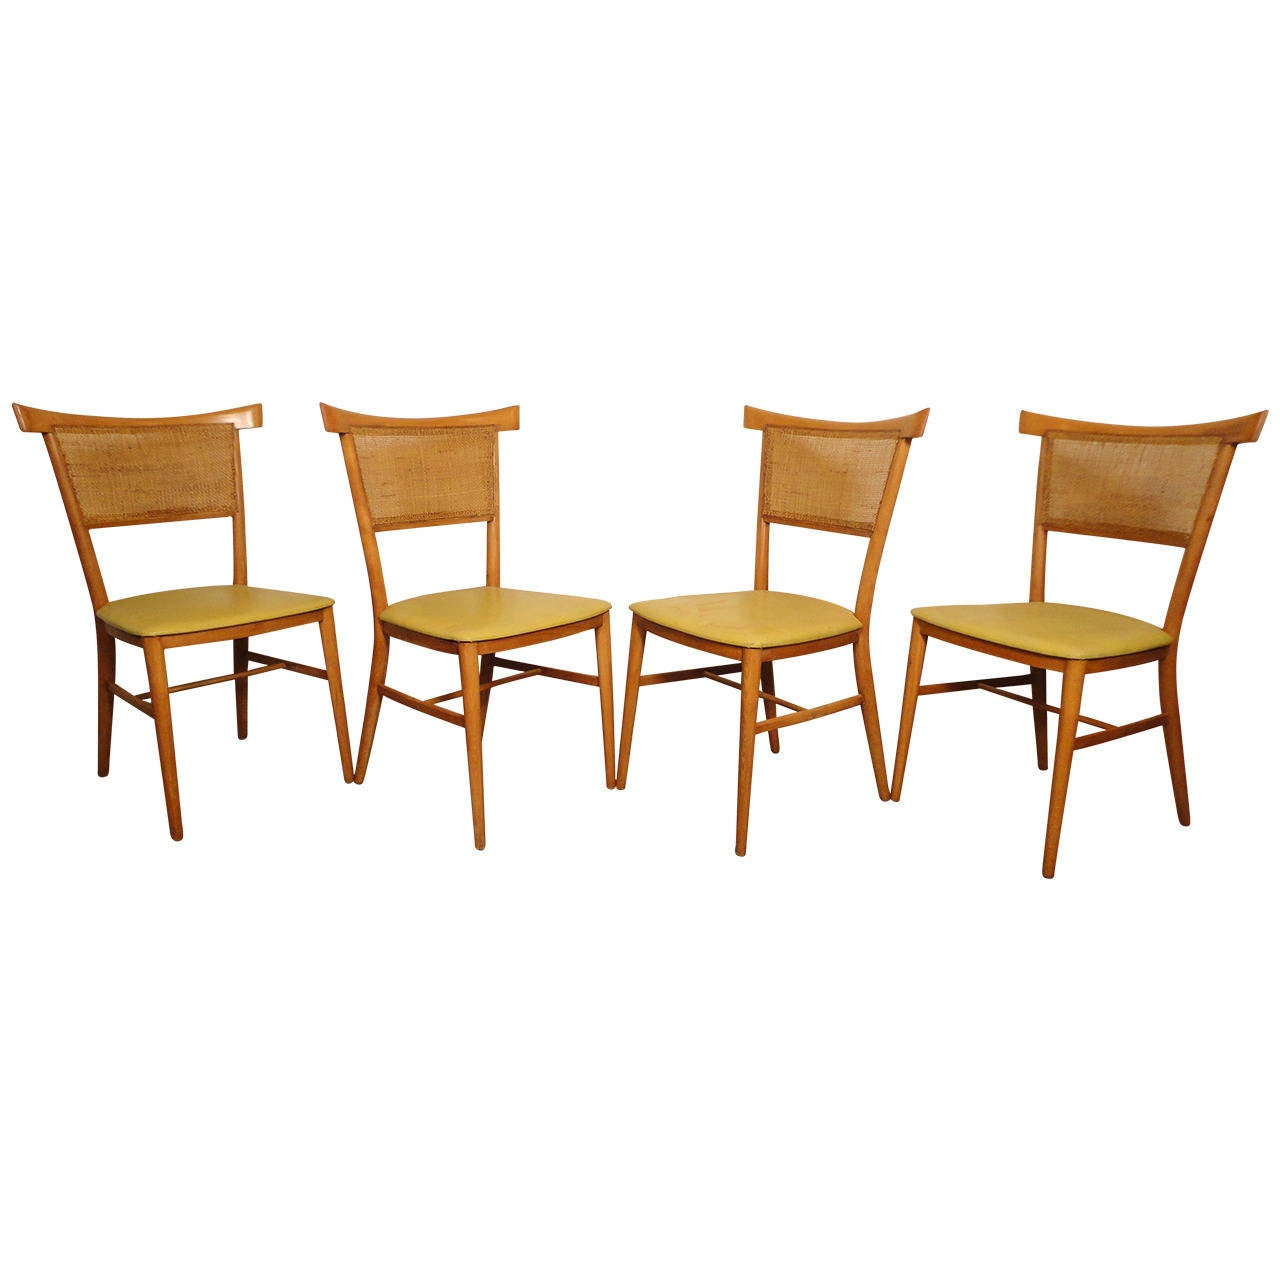 "Paul McCobb ""Bow Tie"" Chairs"